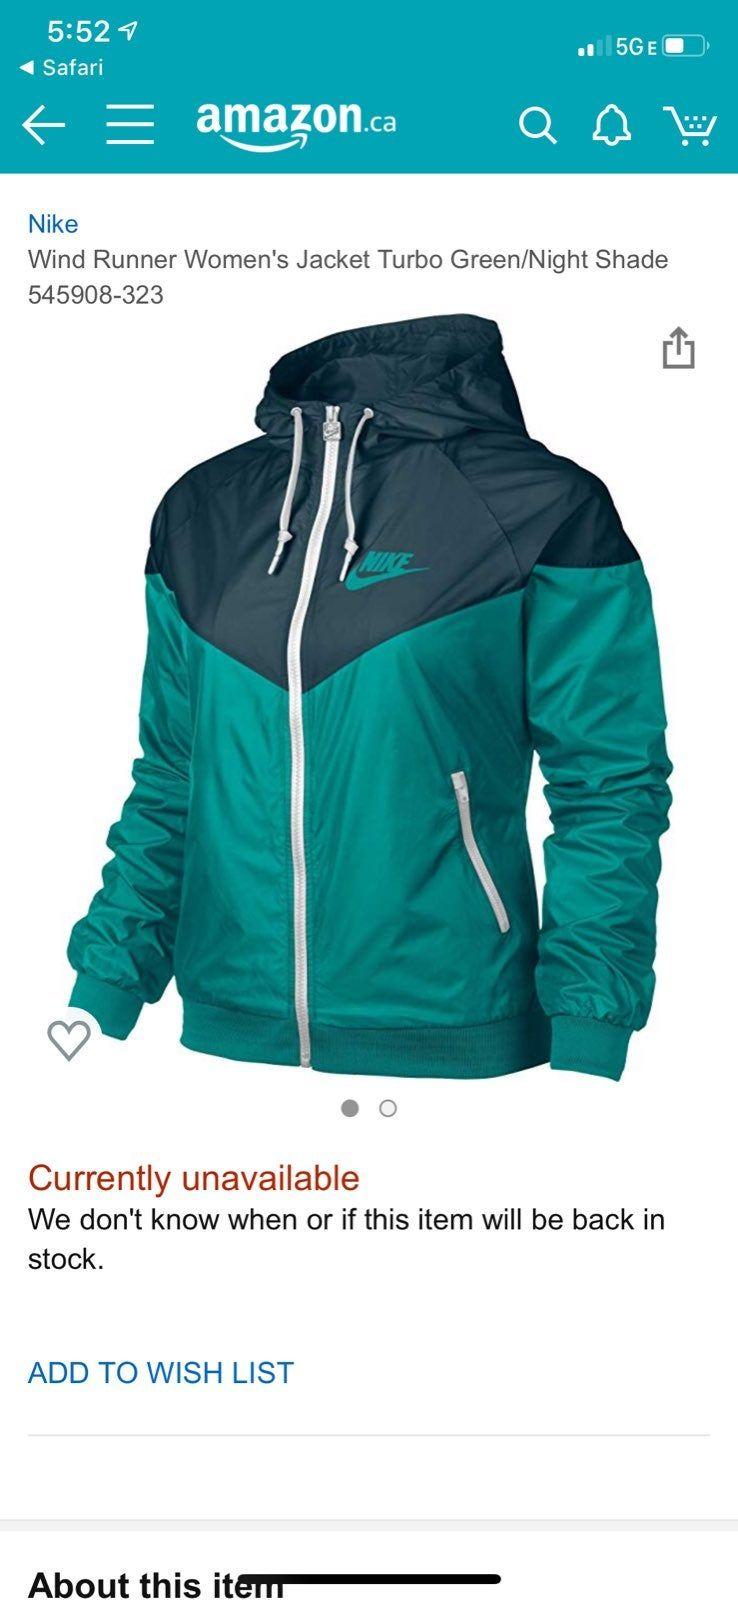 Nike Wind Runner Jacket Turbo Green